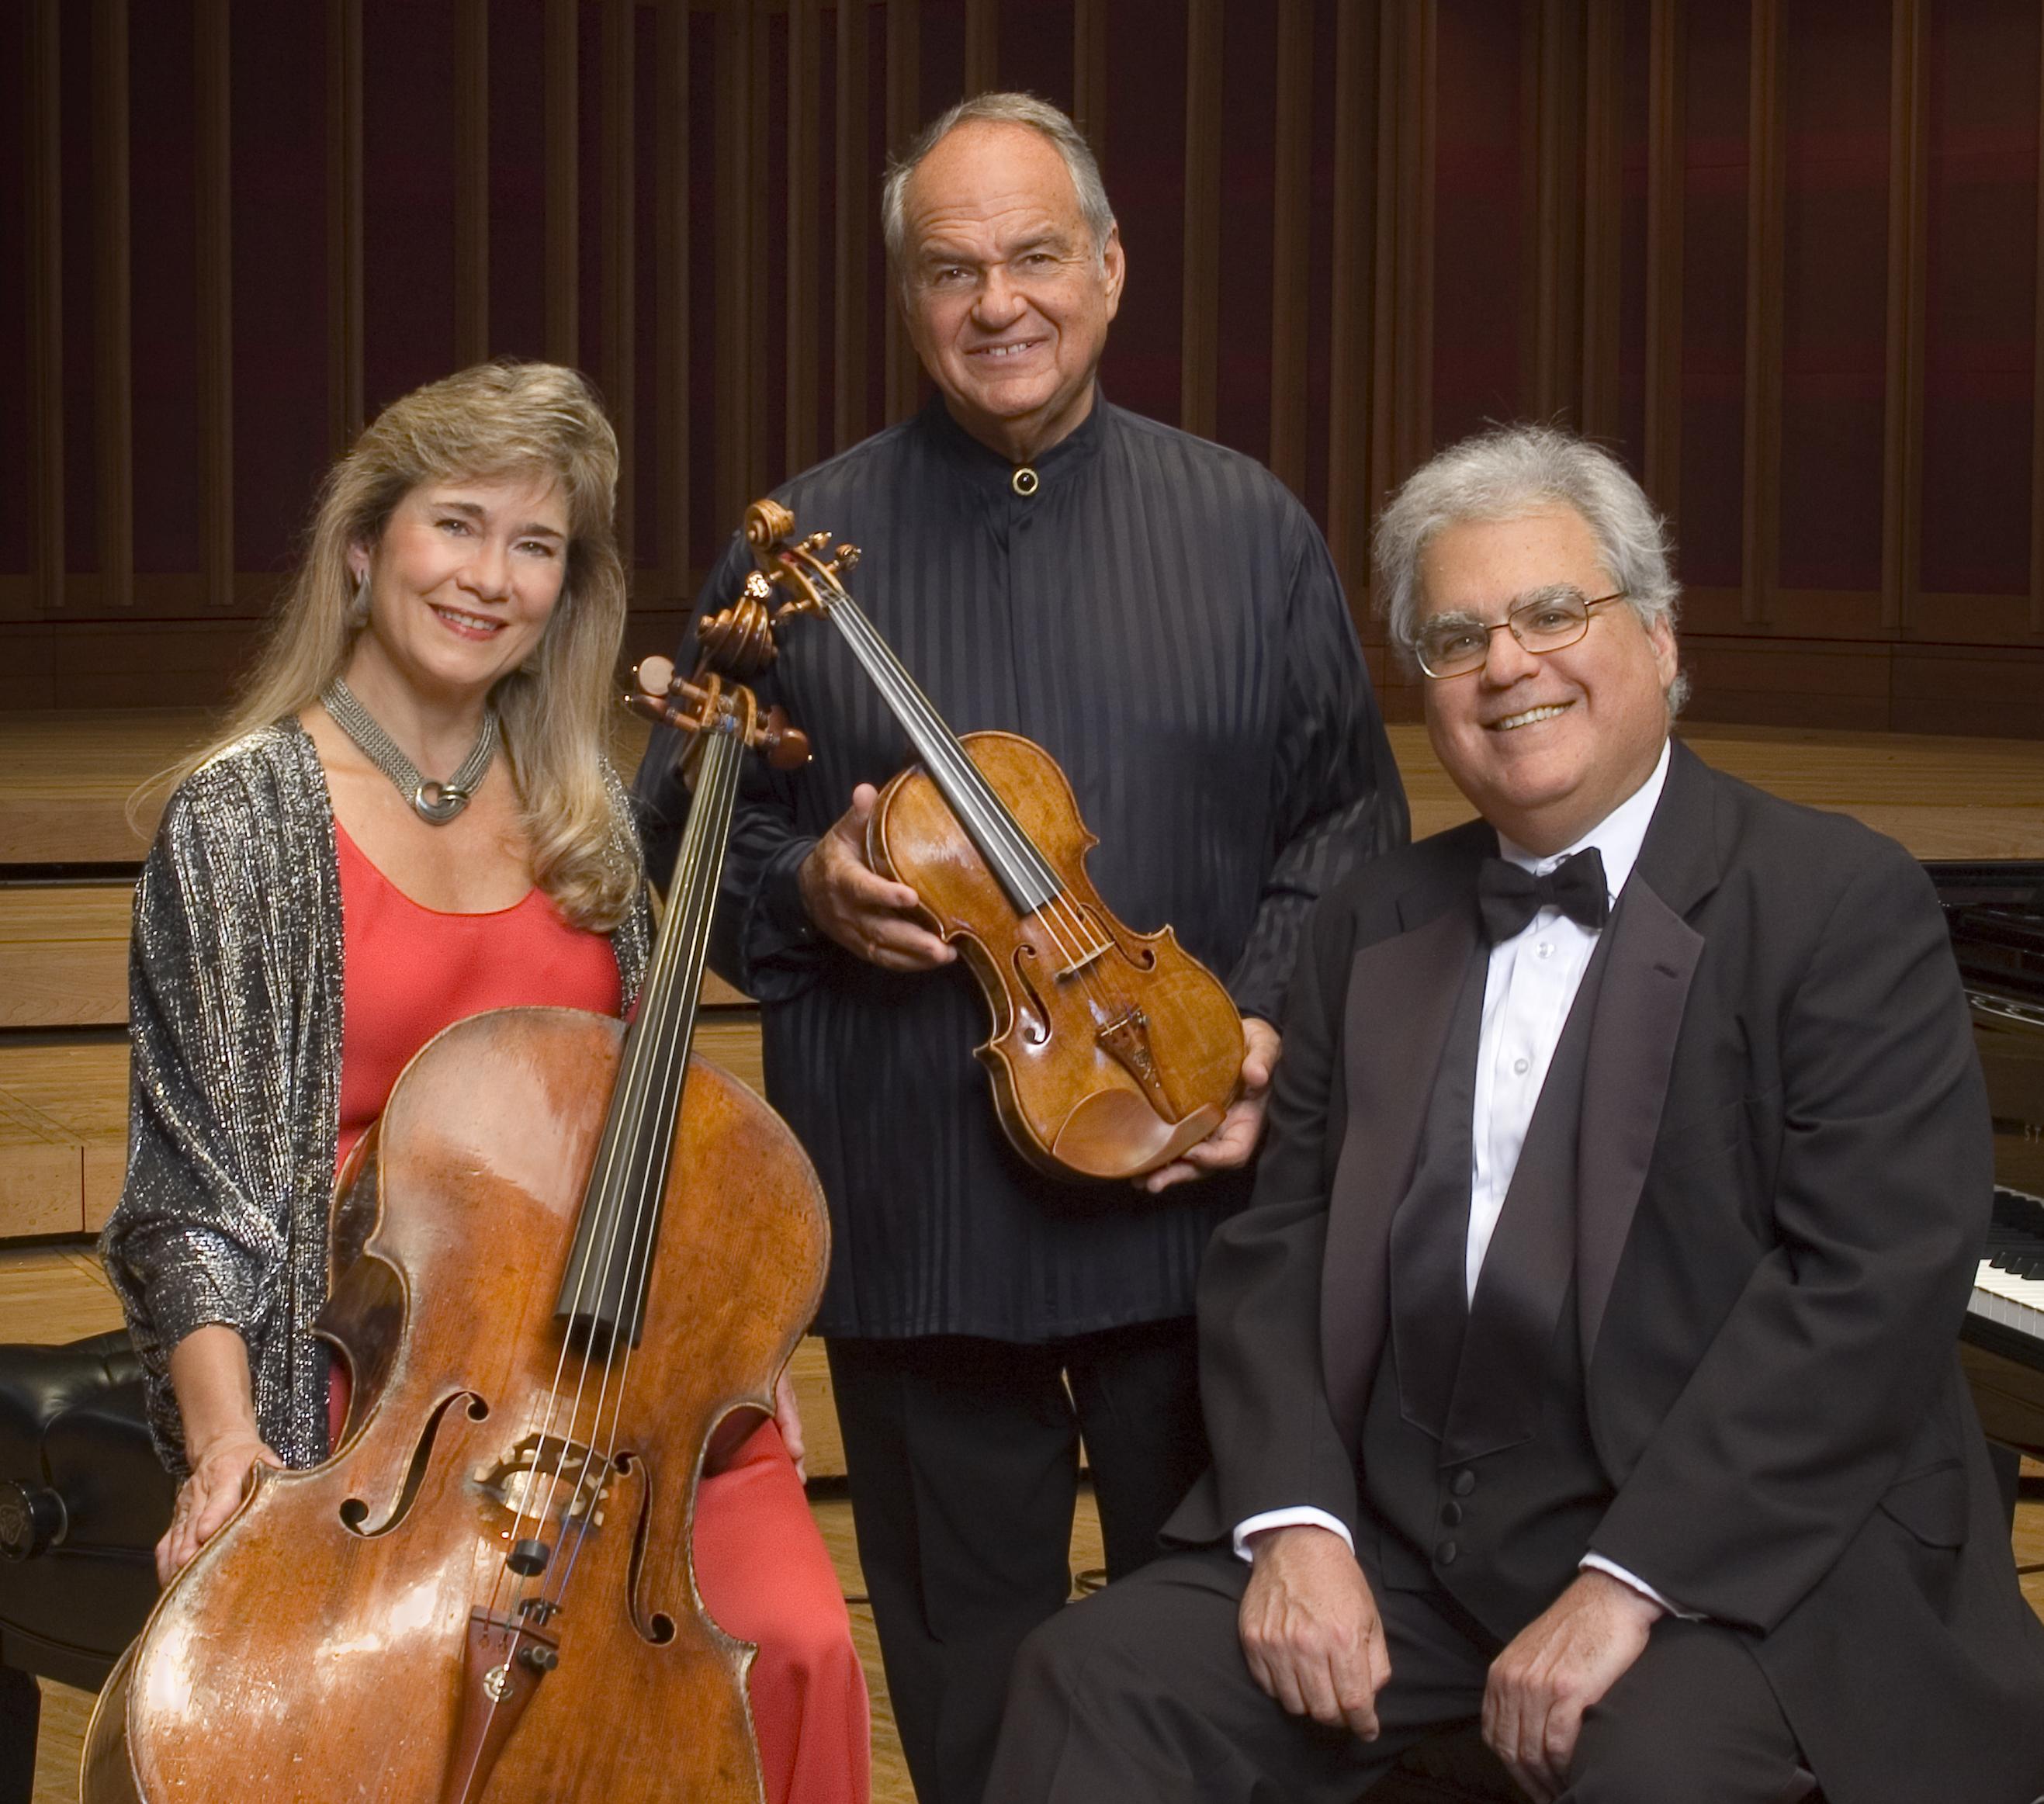 Sharon Robinson, Jaime Laredo and Joseph Kalichstein.